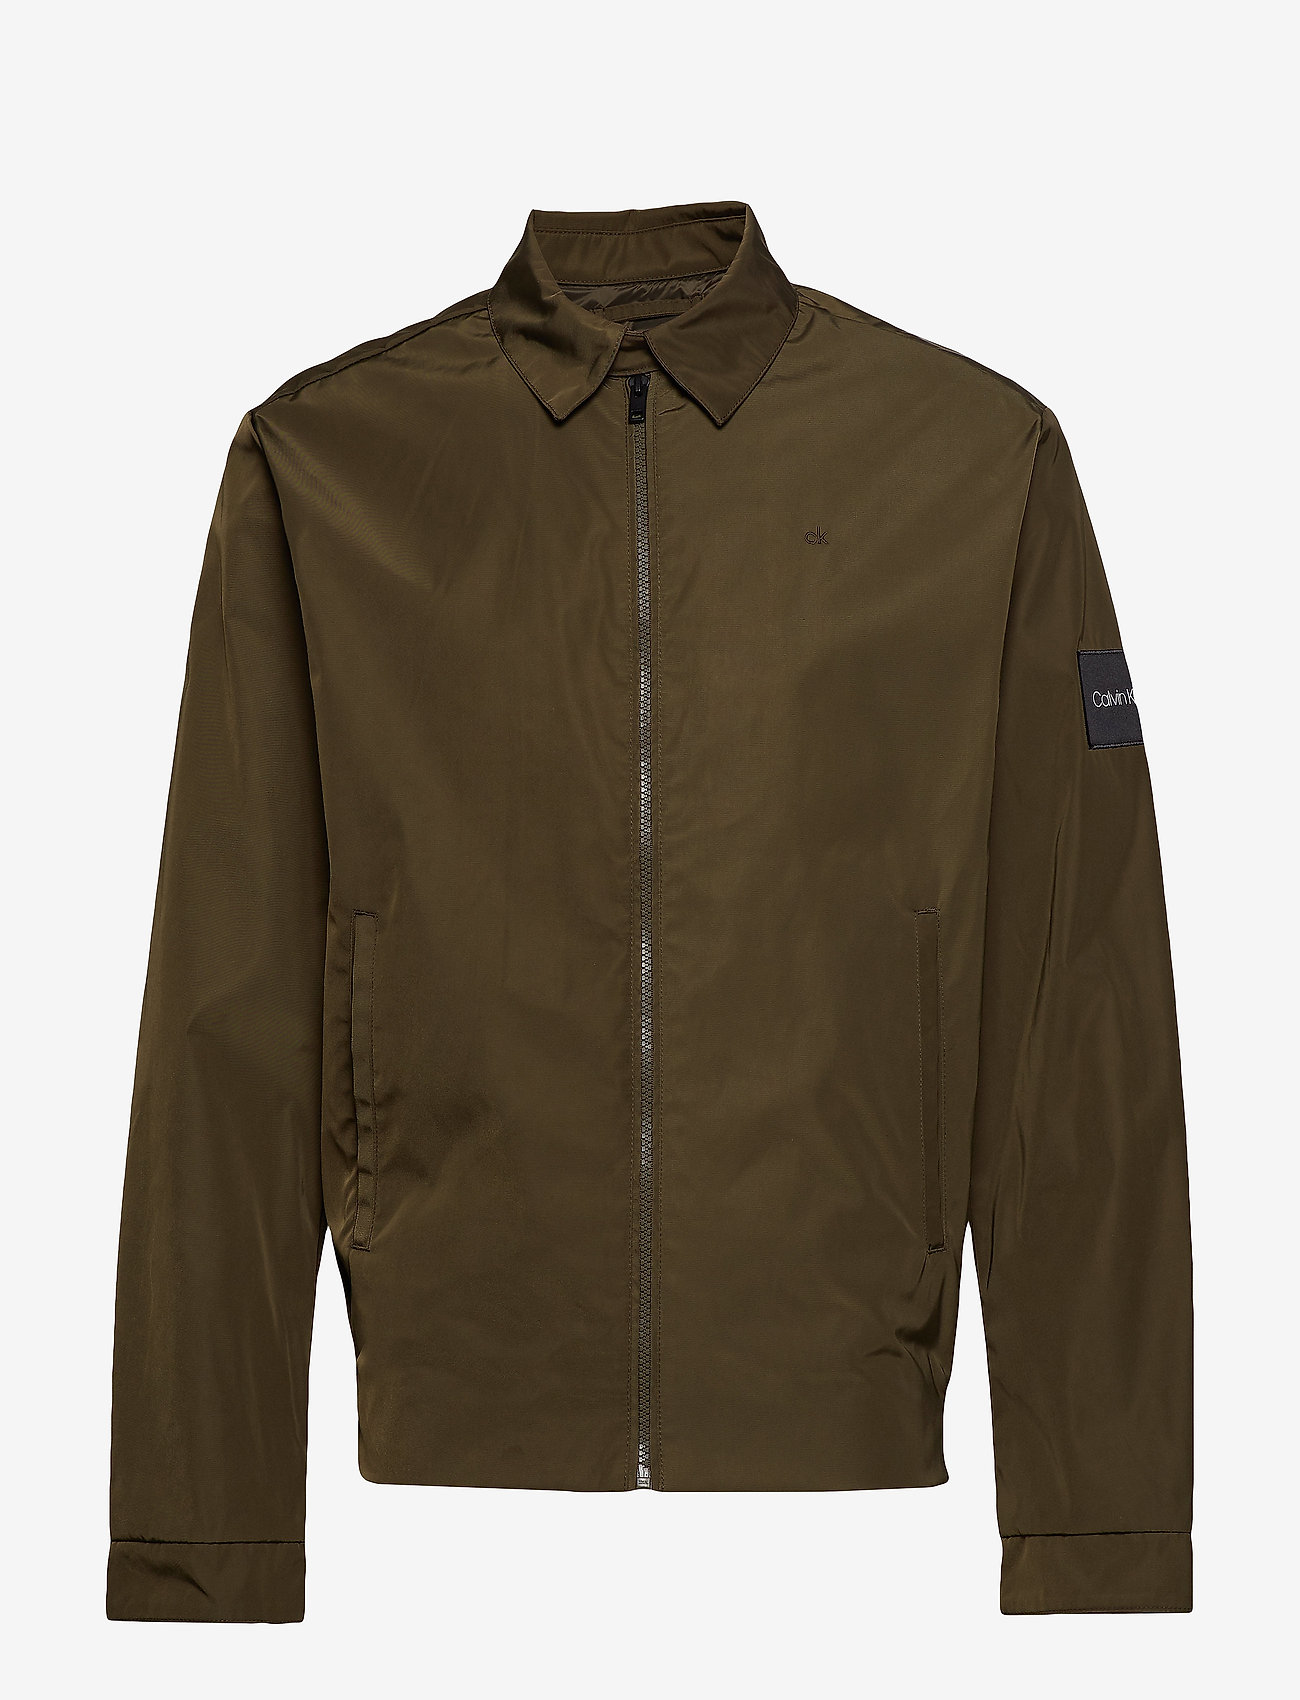 Calvin Klein - NYLON HARRINGTON JAC - light jackets - ck dark olive - 0